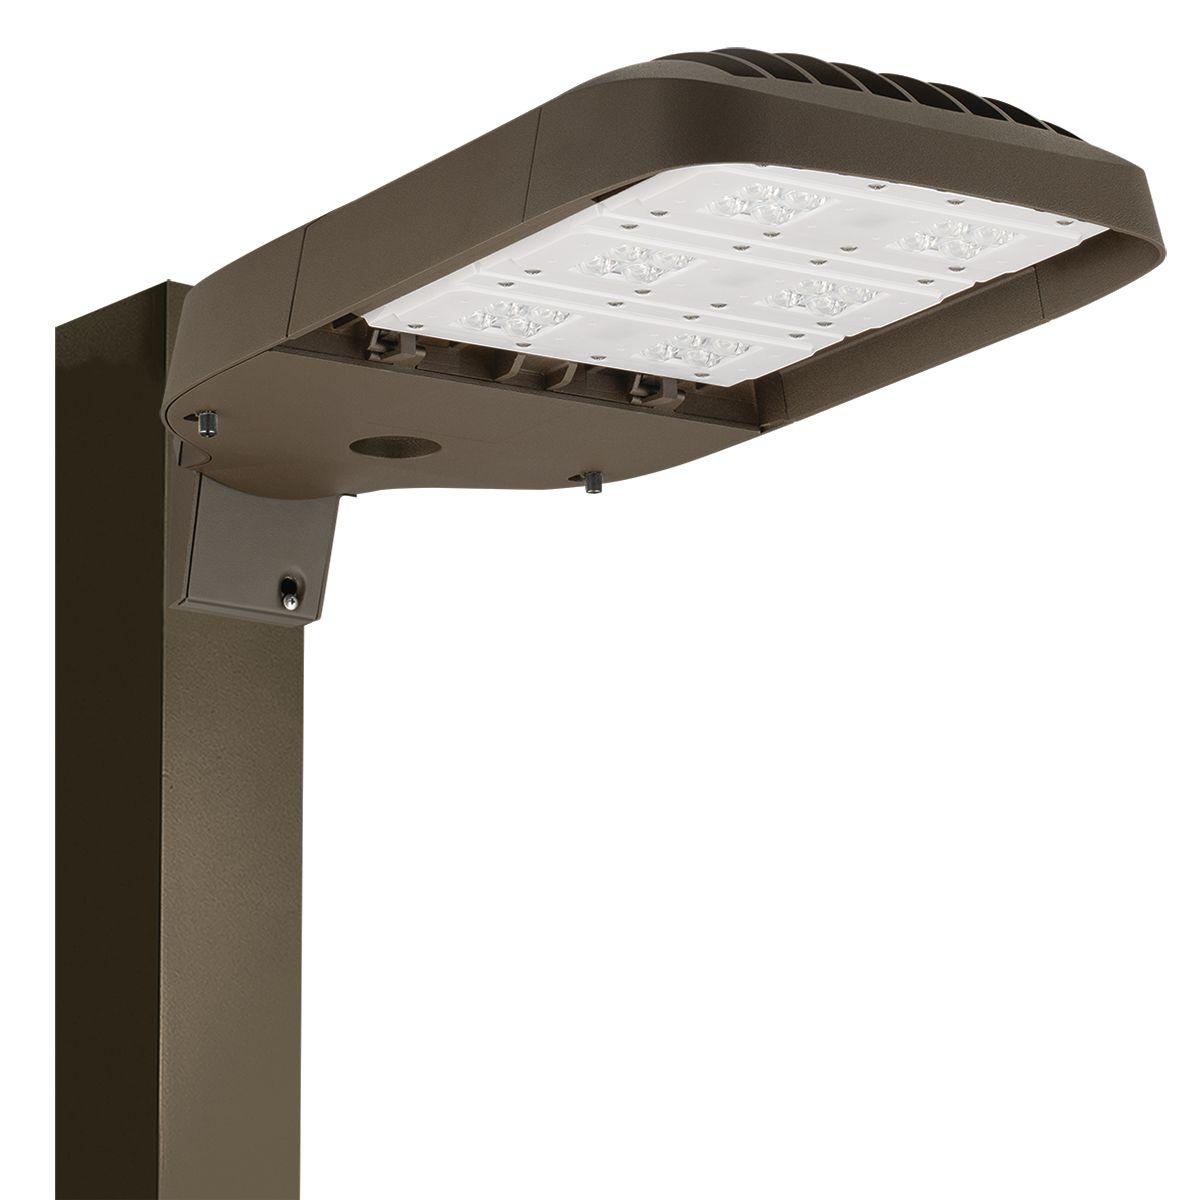 Airo | Hubbell Outdoor Lighting